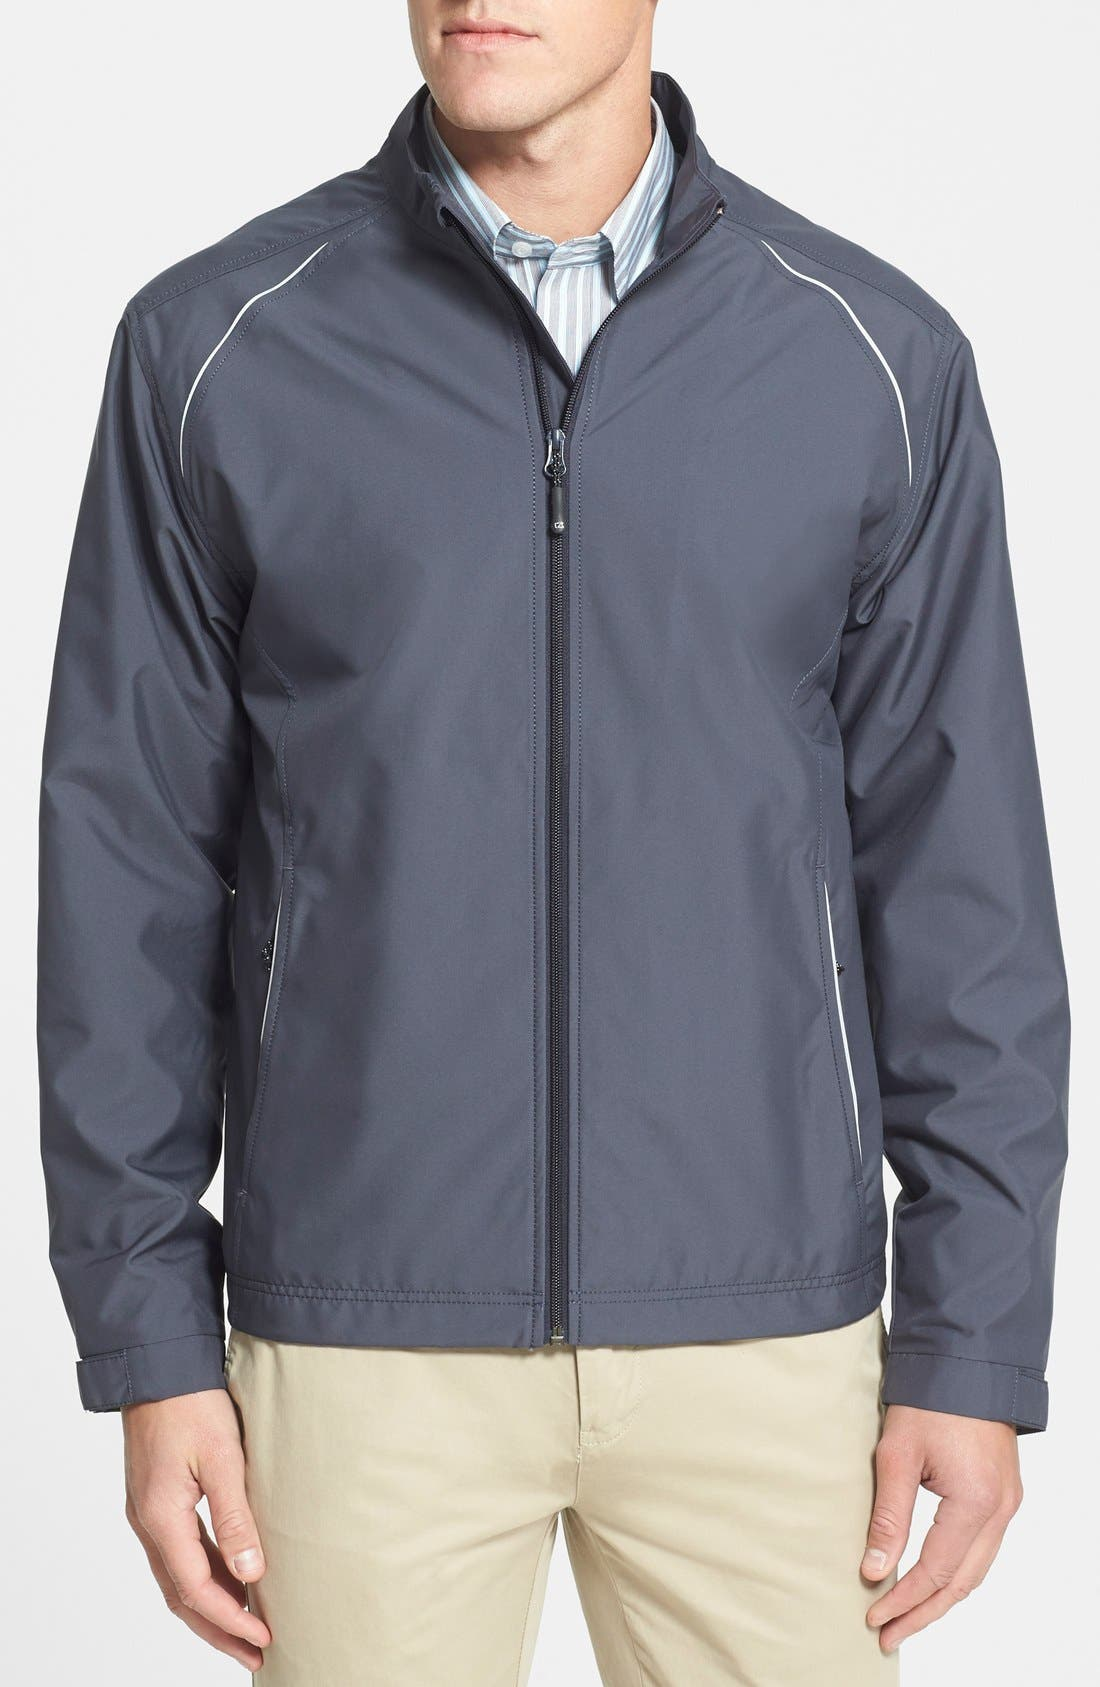 Alternate Image 1 Selected - Cutter & Buck Beacon WeatherTec Wind & Water Resistant Jacket